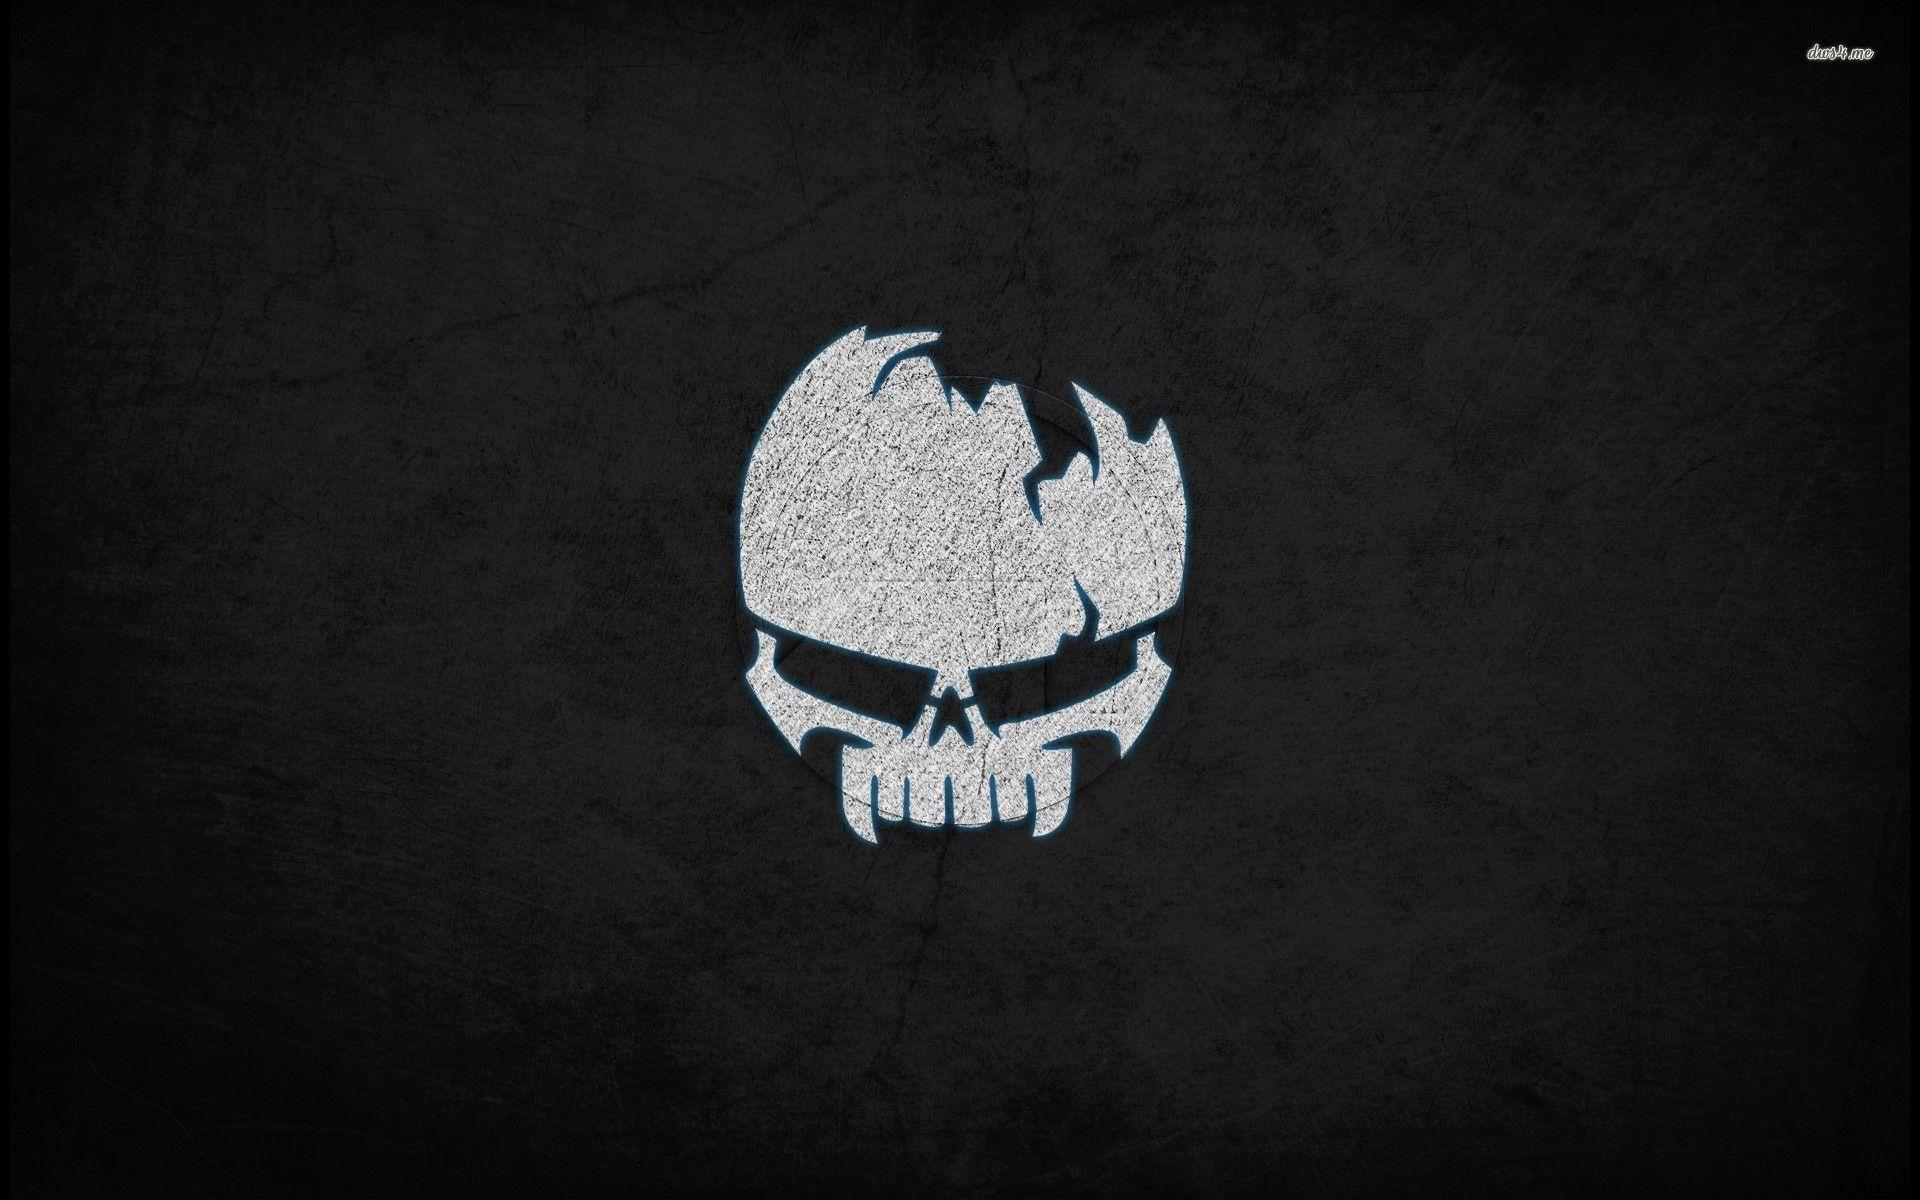 hdq skull wallpapers desktop k high definition pictures | wallpapers